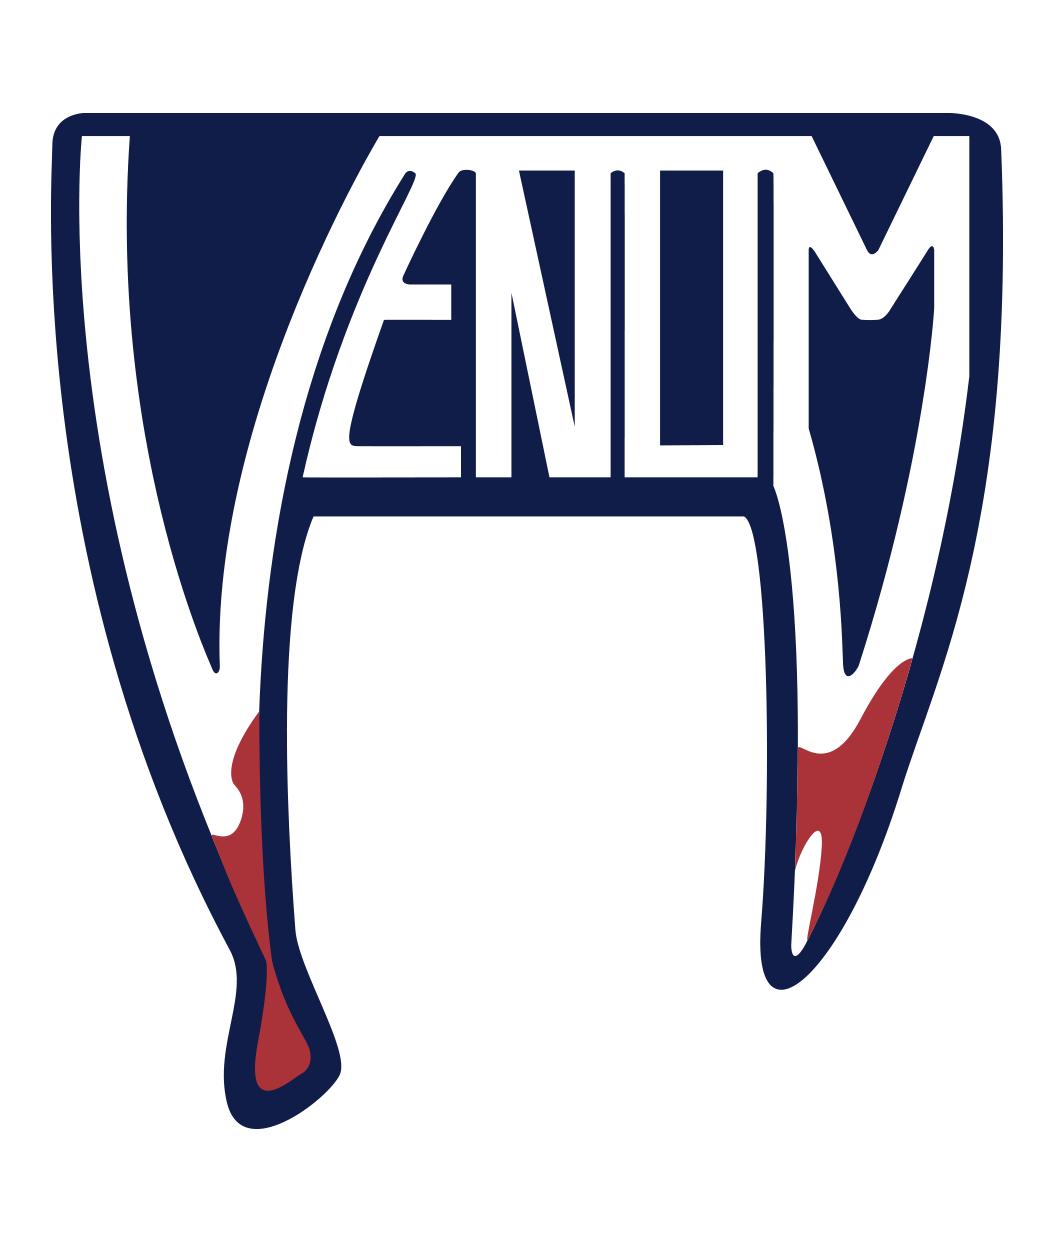 Venom Lacrosse Sticker – iBrand Sports